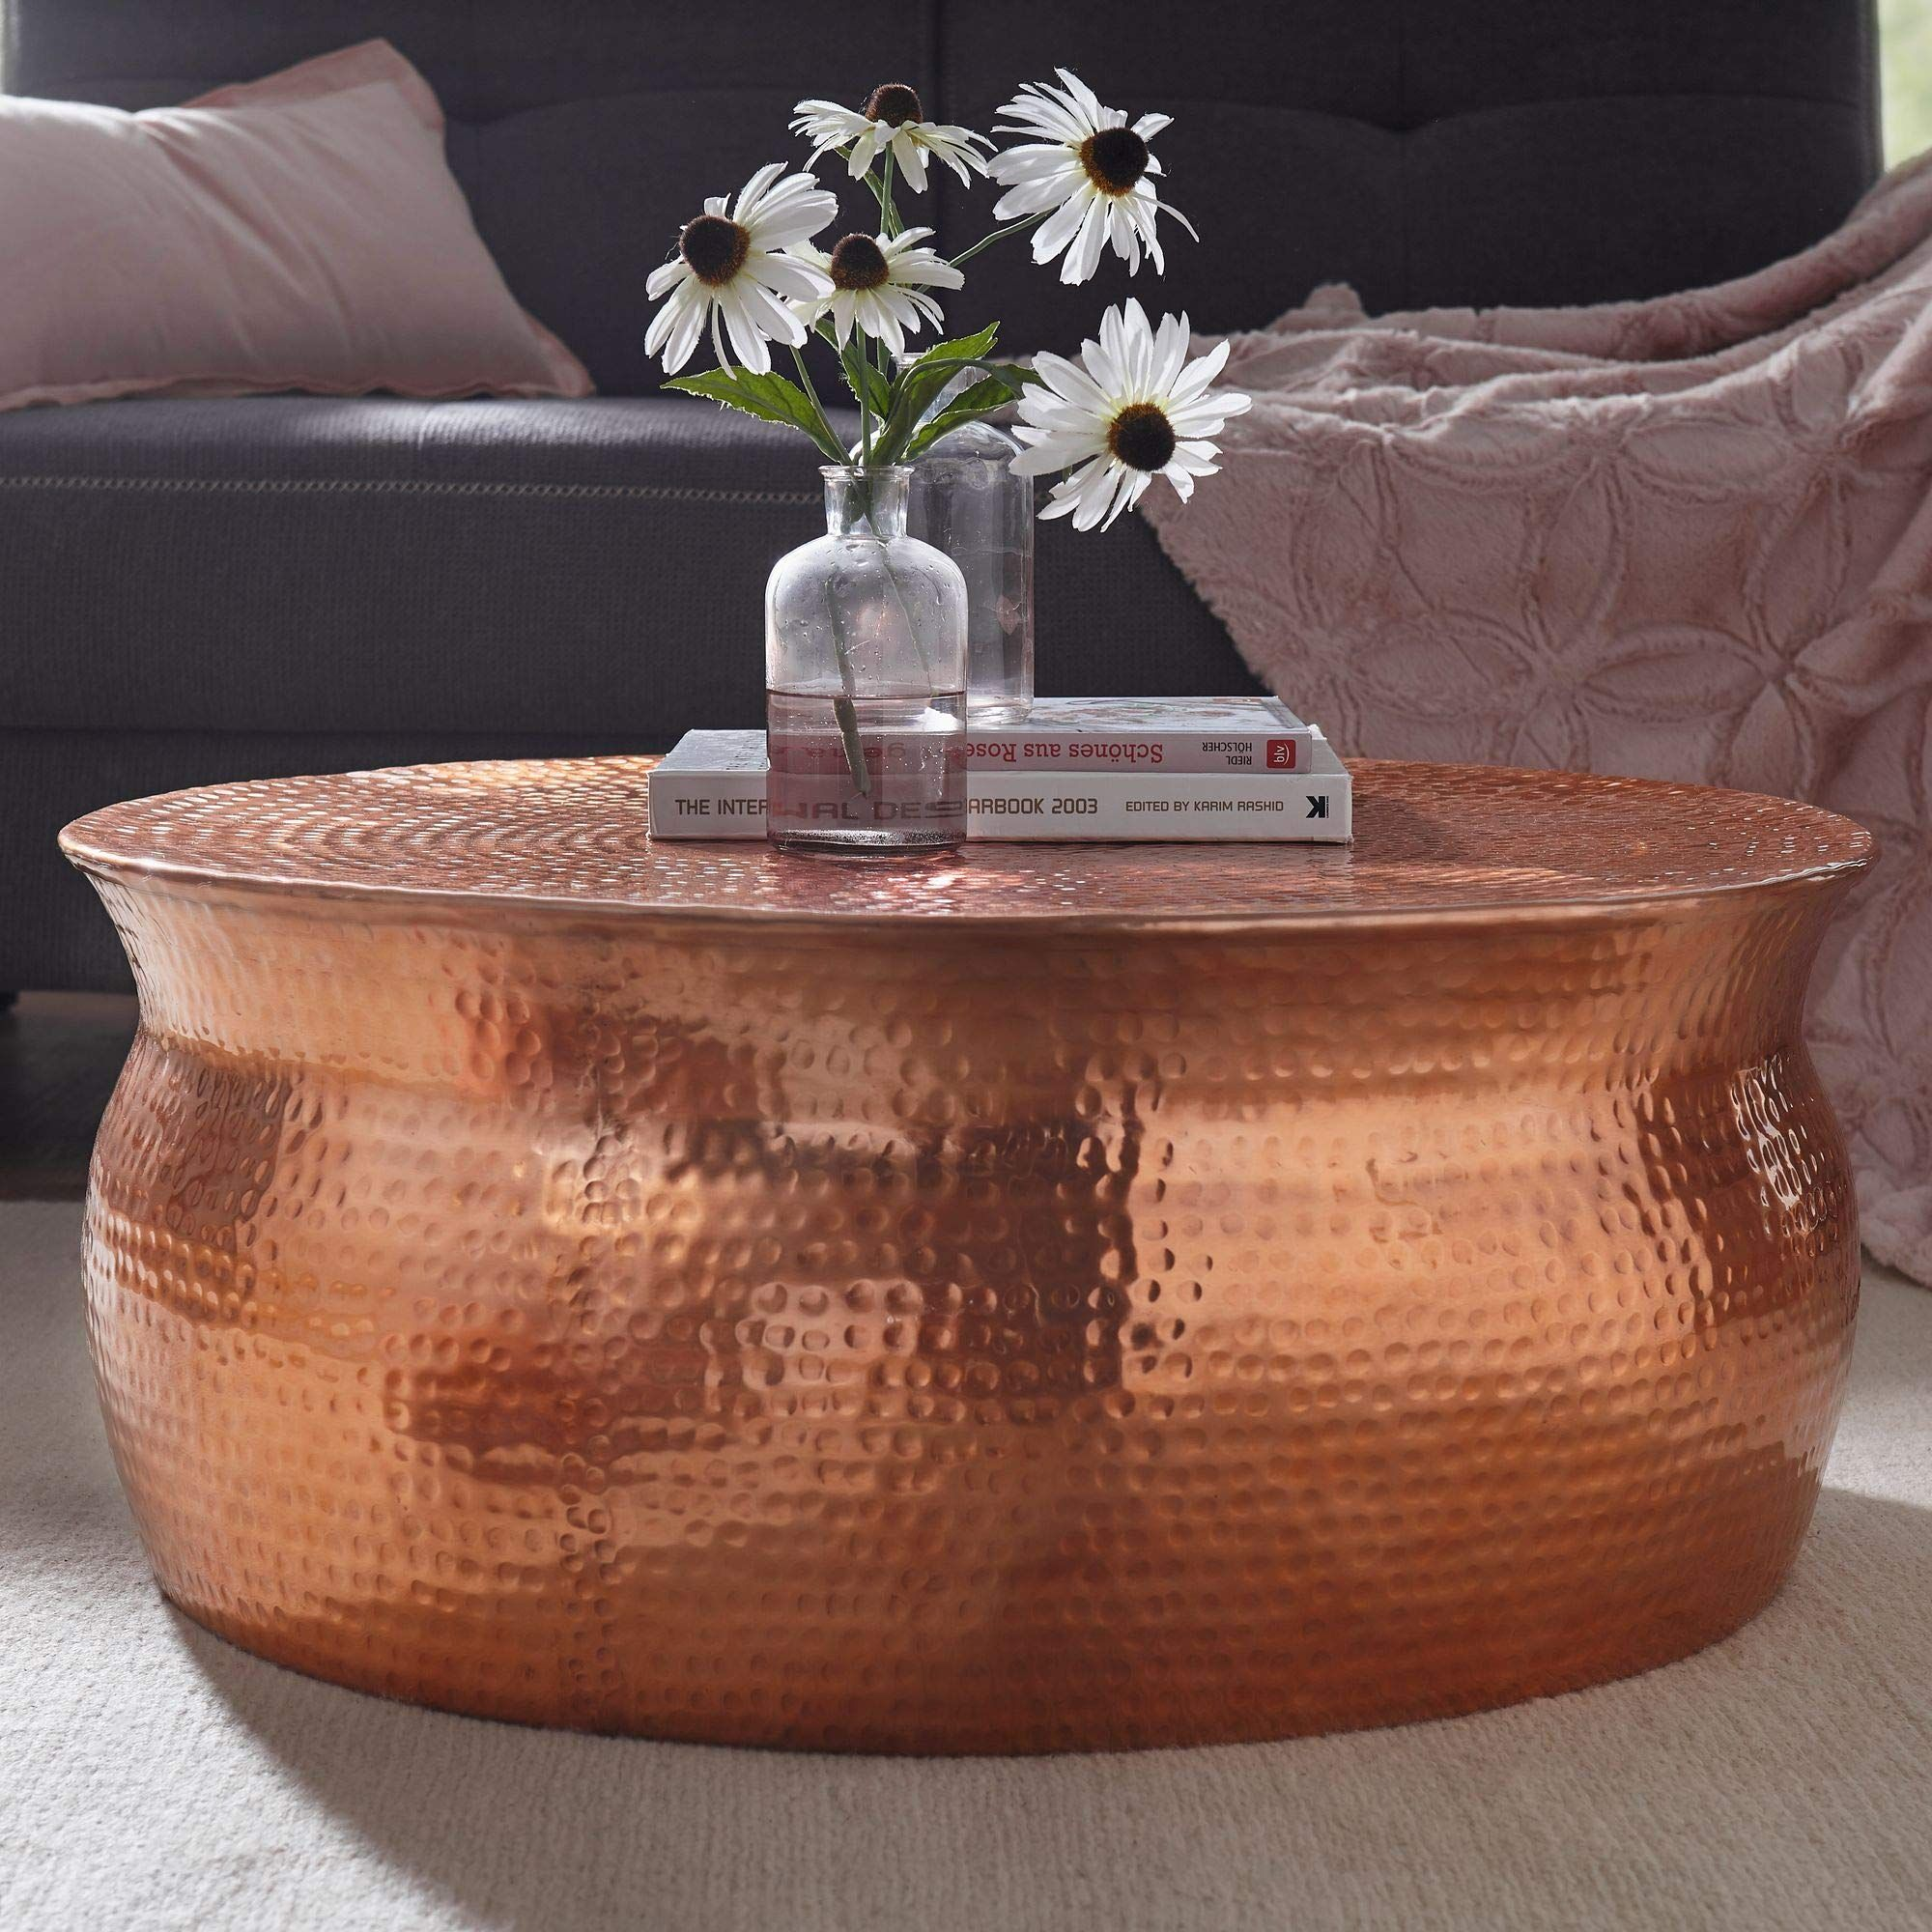 Wohnling Karam Couchtisch Aluminium Kupfer 75x31x75 Cm Coffee Table Copper Coffee Table Coffee Table Setting [ 2000 x 2000 Pixel ]